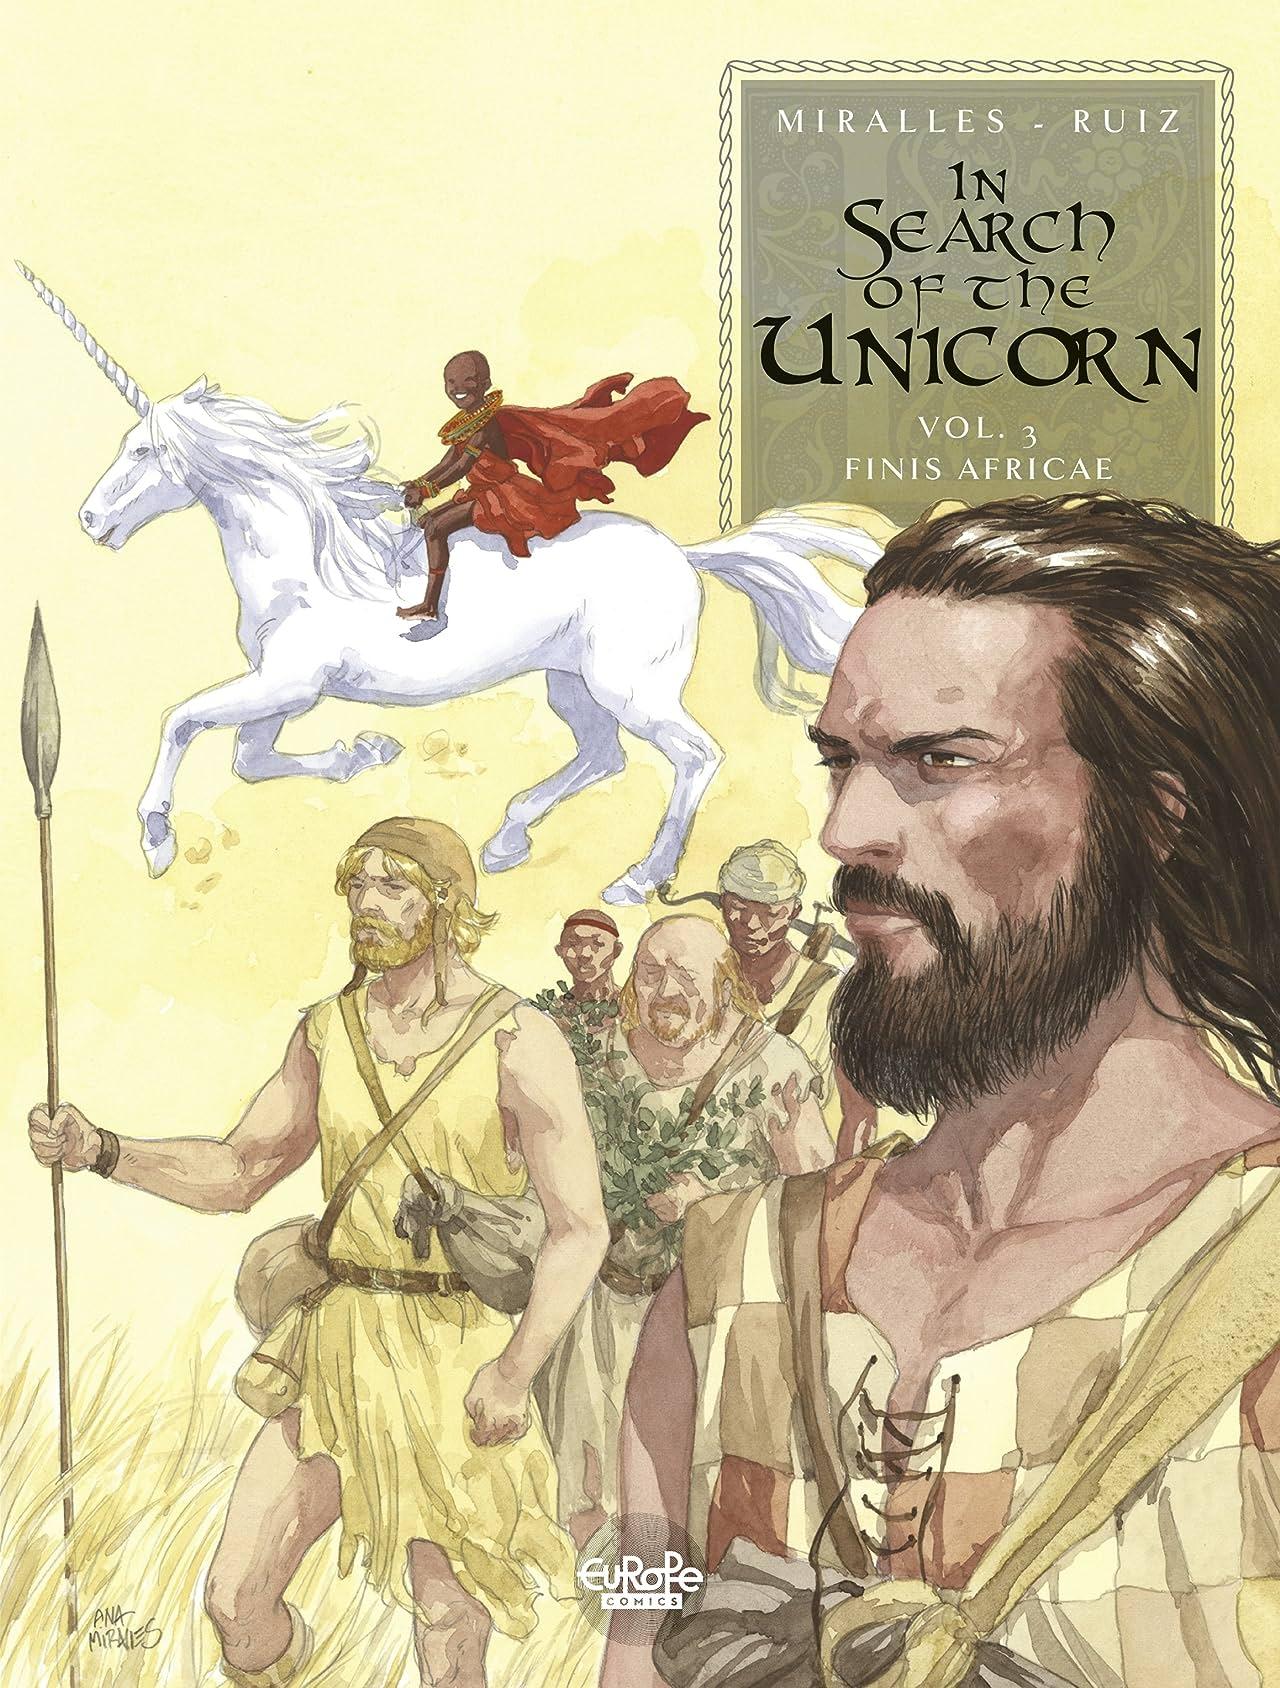 In Search of the Unicorn Vol. 3